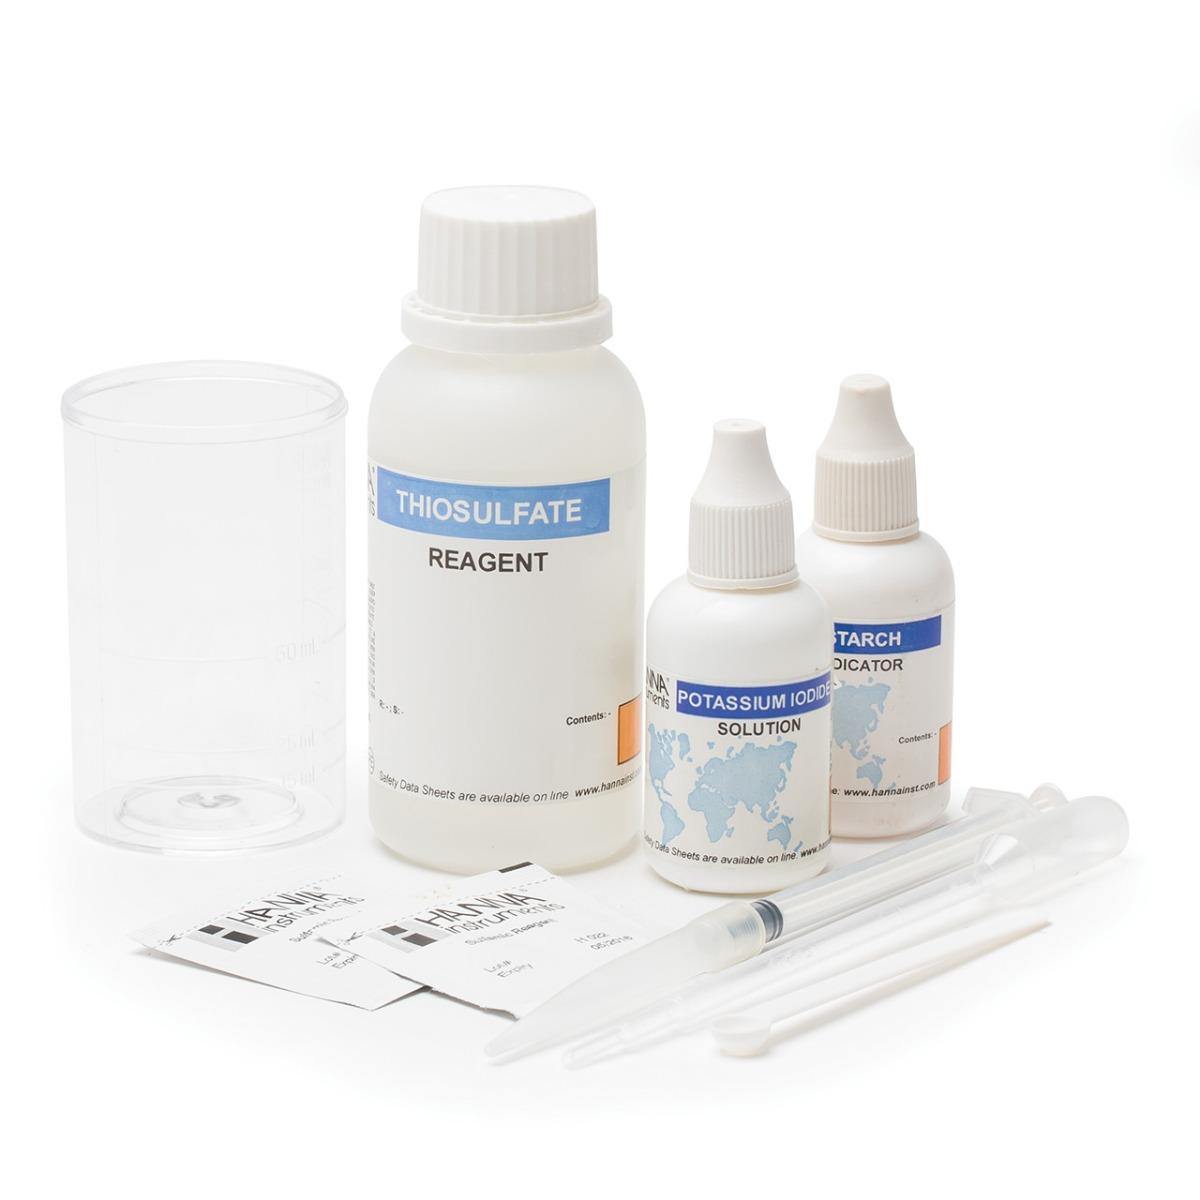 HI38023 Total Chlorine Extended Range Test Kit